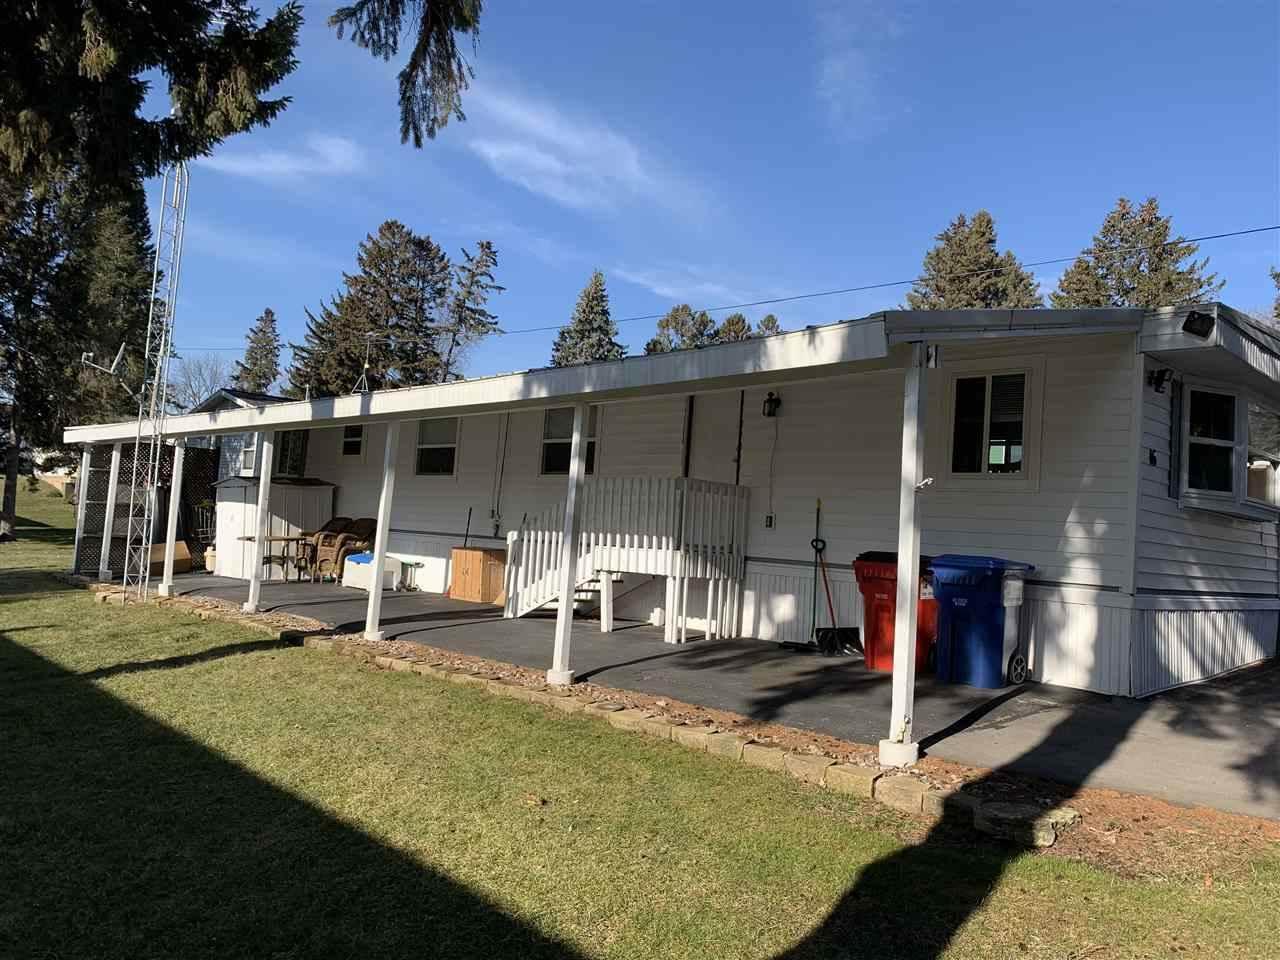 W9194 Ripley Rd L16, Oakland, WI 53523